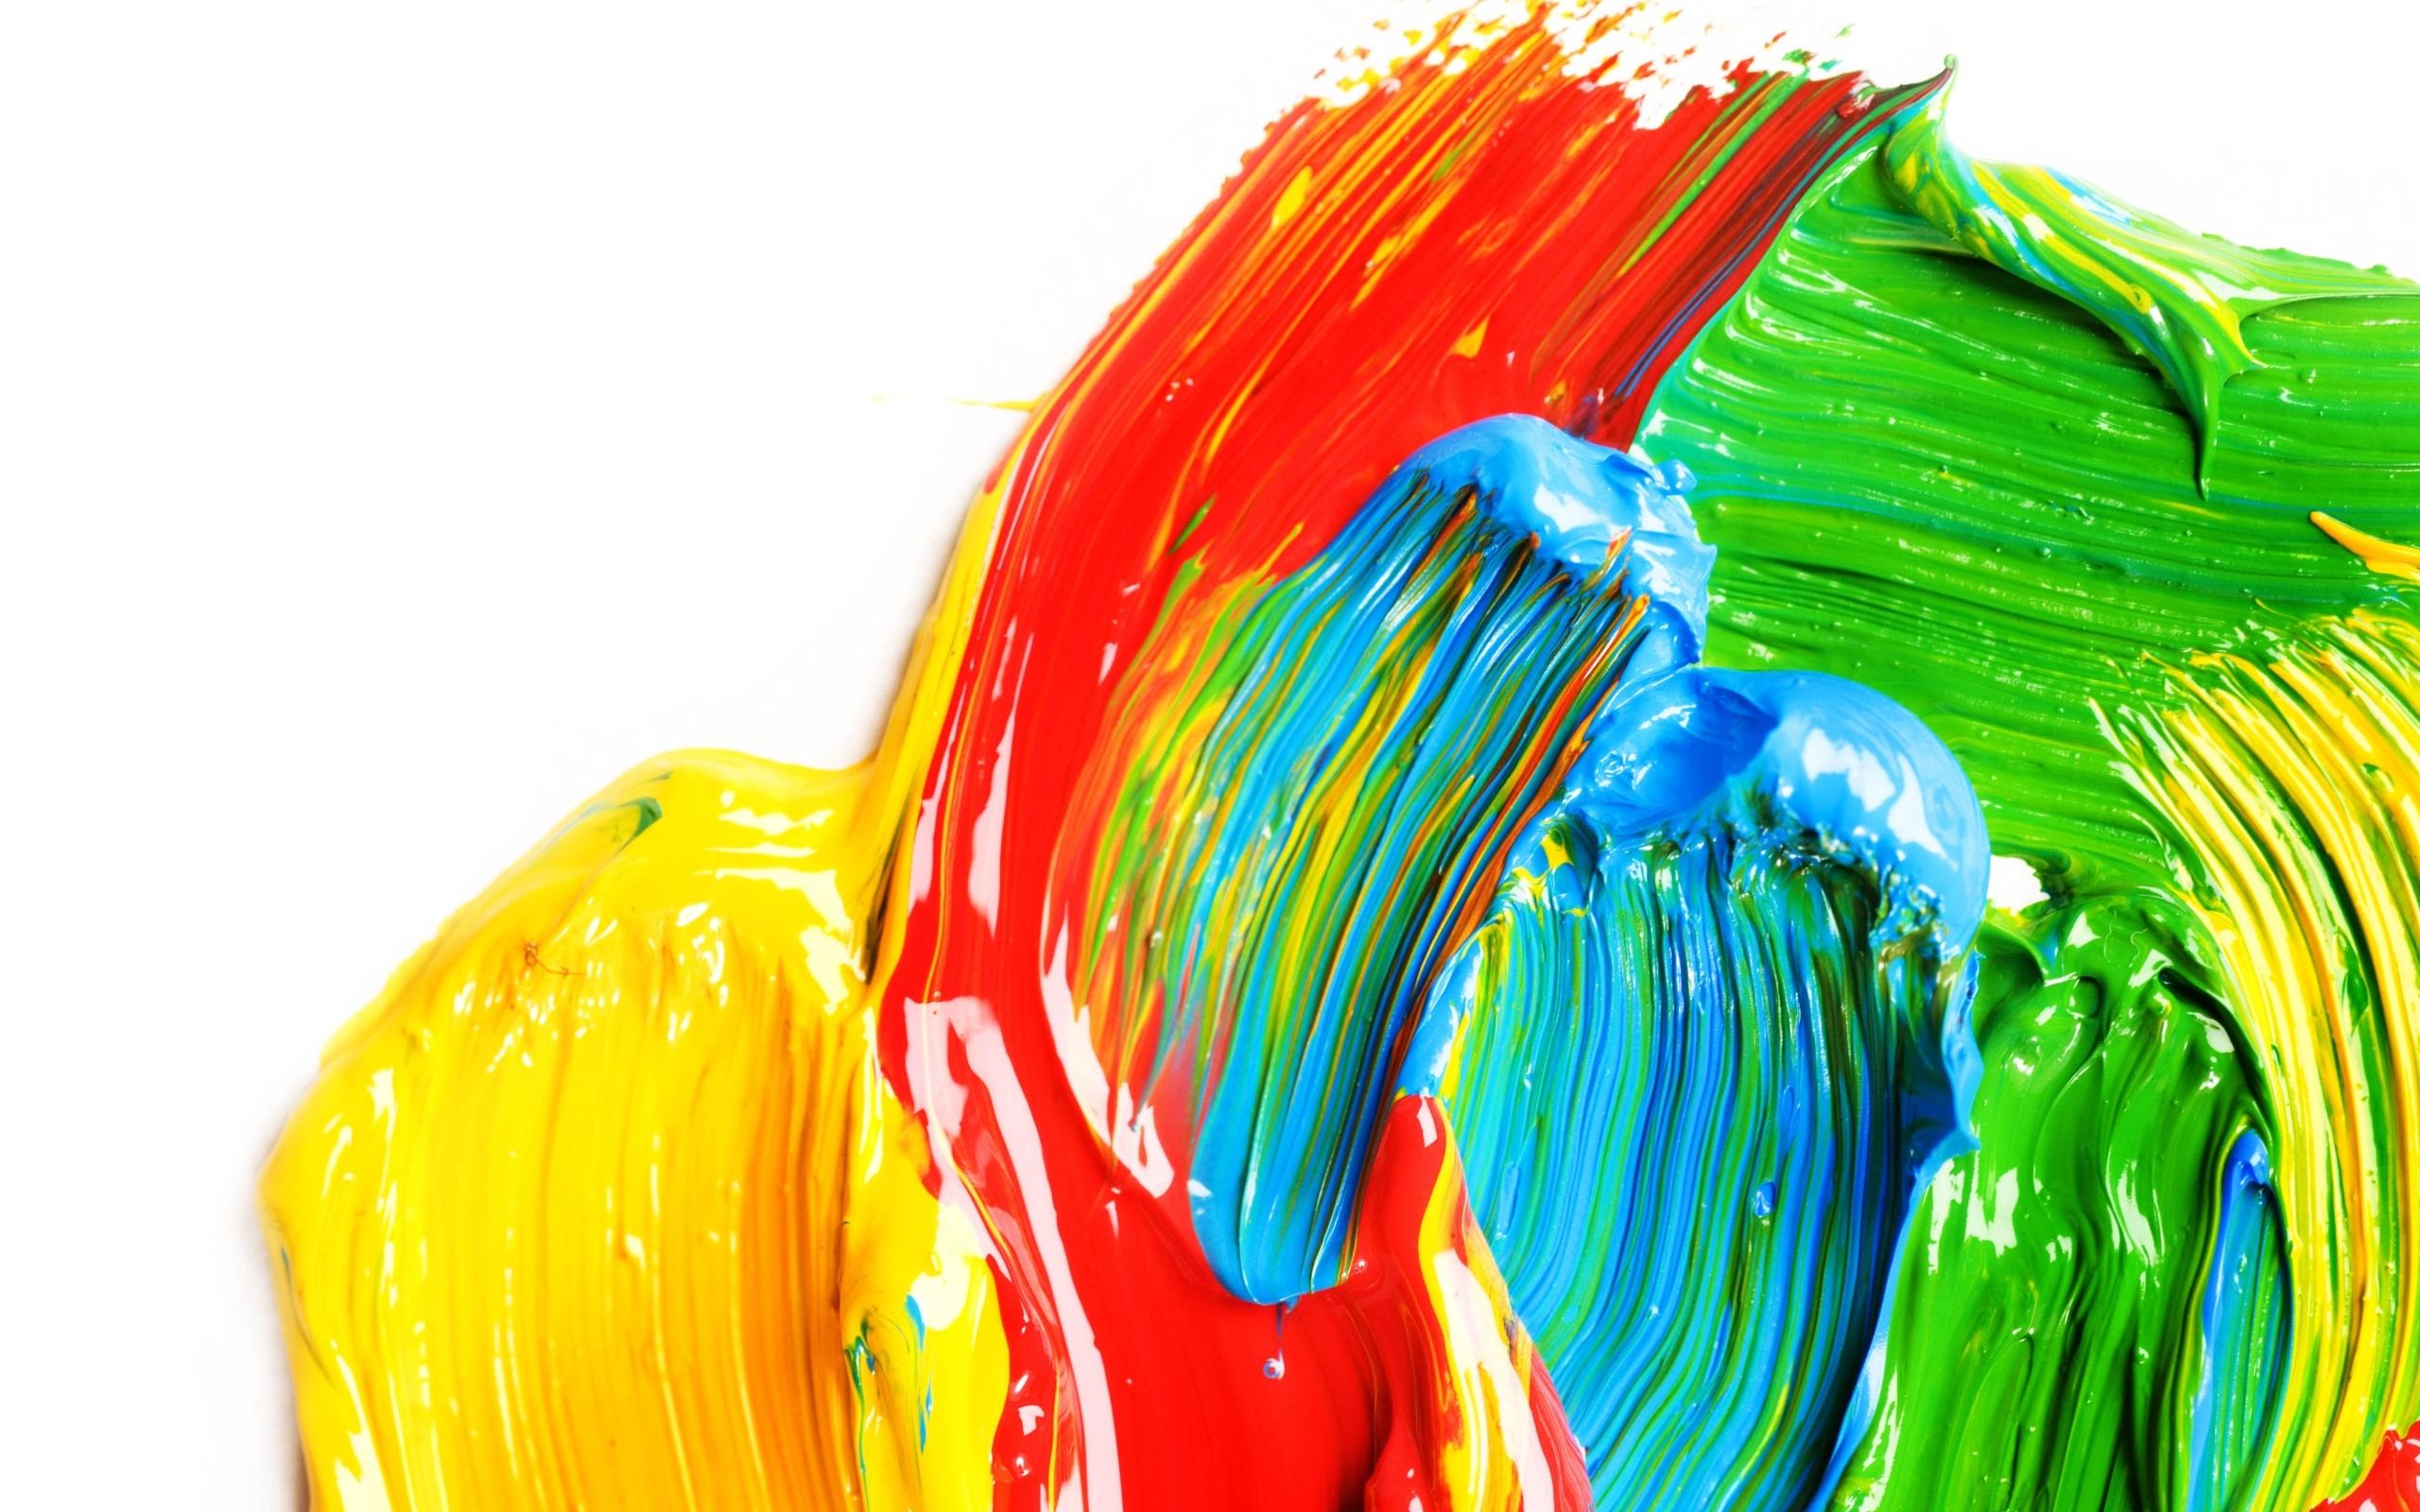 Paint Wallpaper  2560x1600  #65942